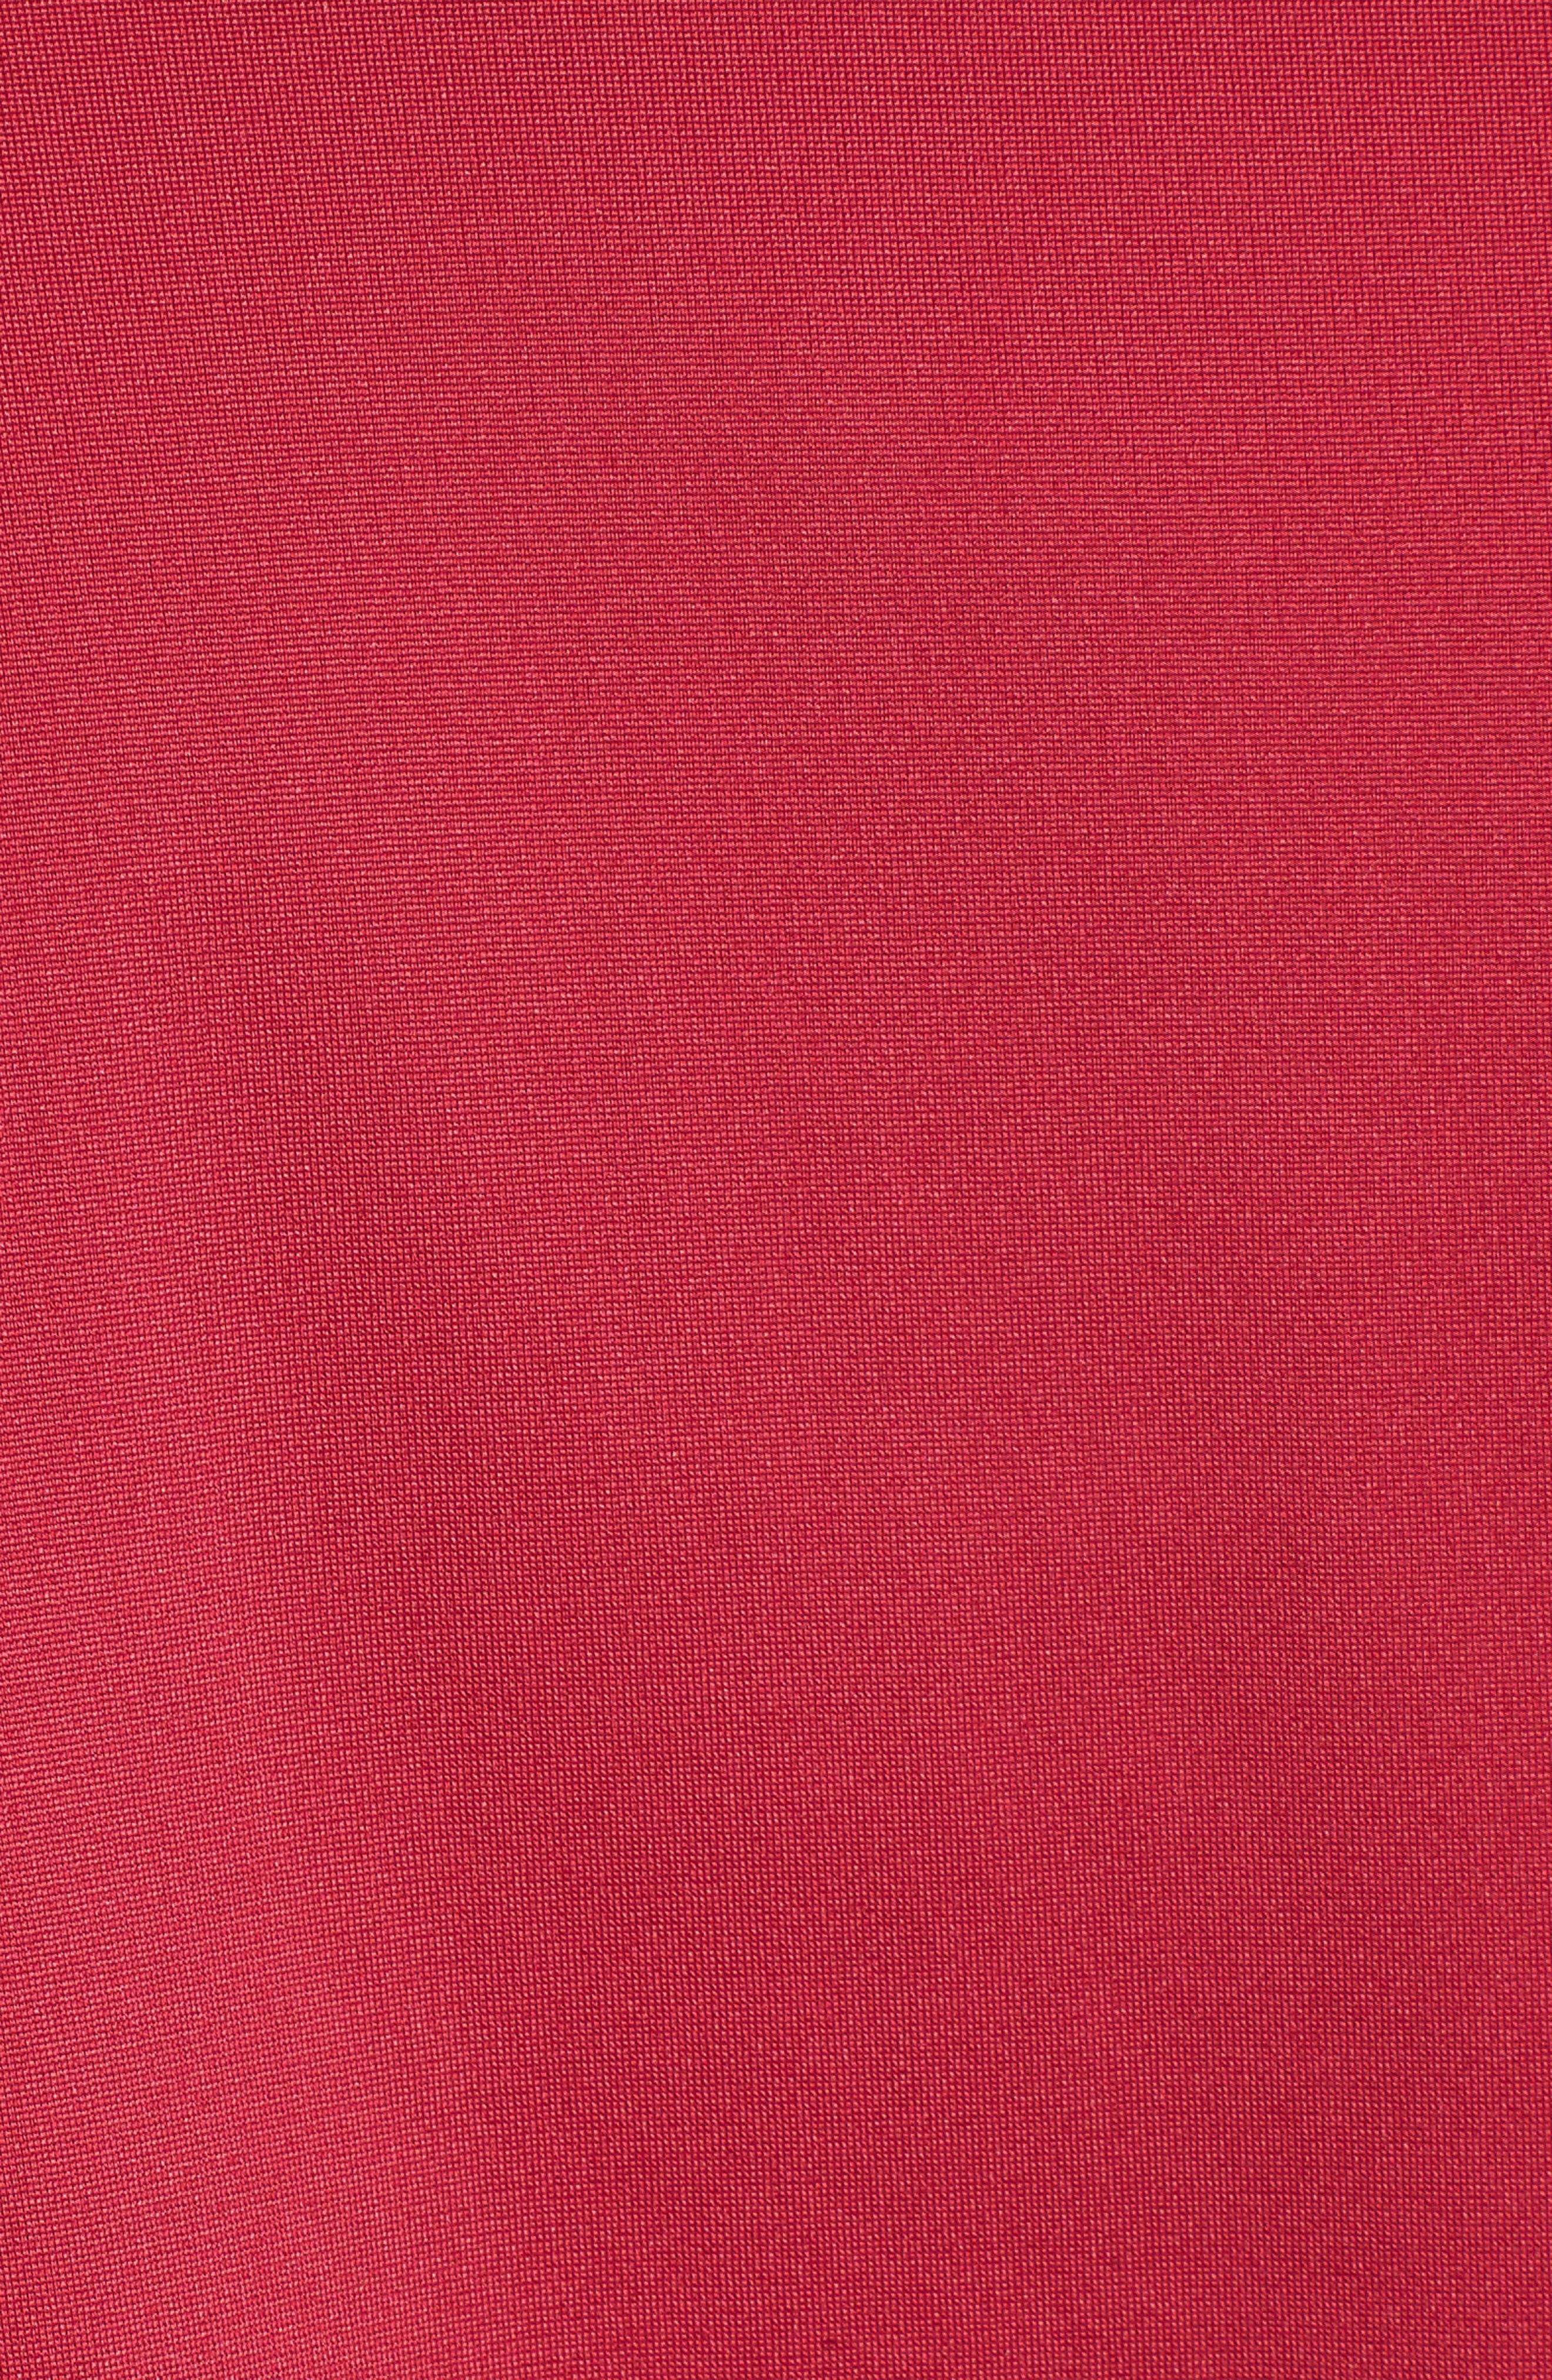 Active Logo Warmup Jacket,                             Alternate thumbnail 7, color,                             REDCERISE-WHITE-GOLD